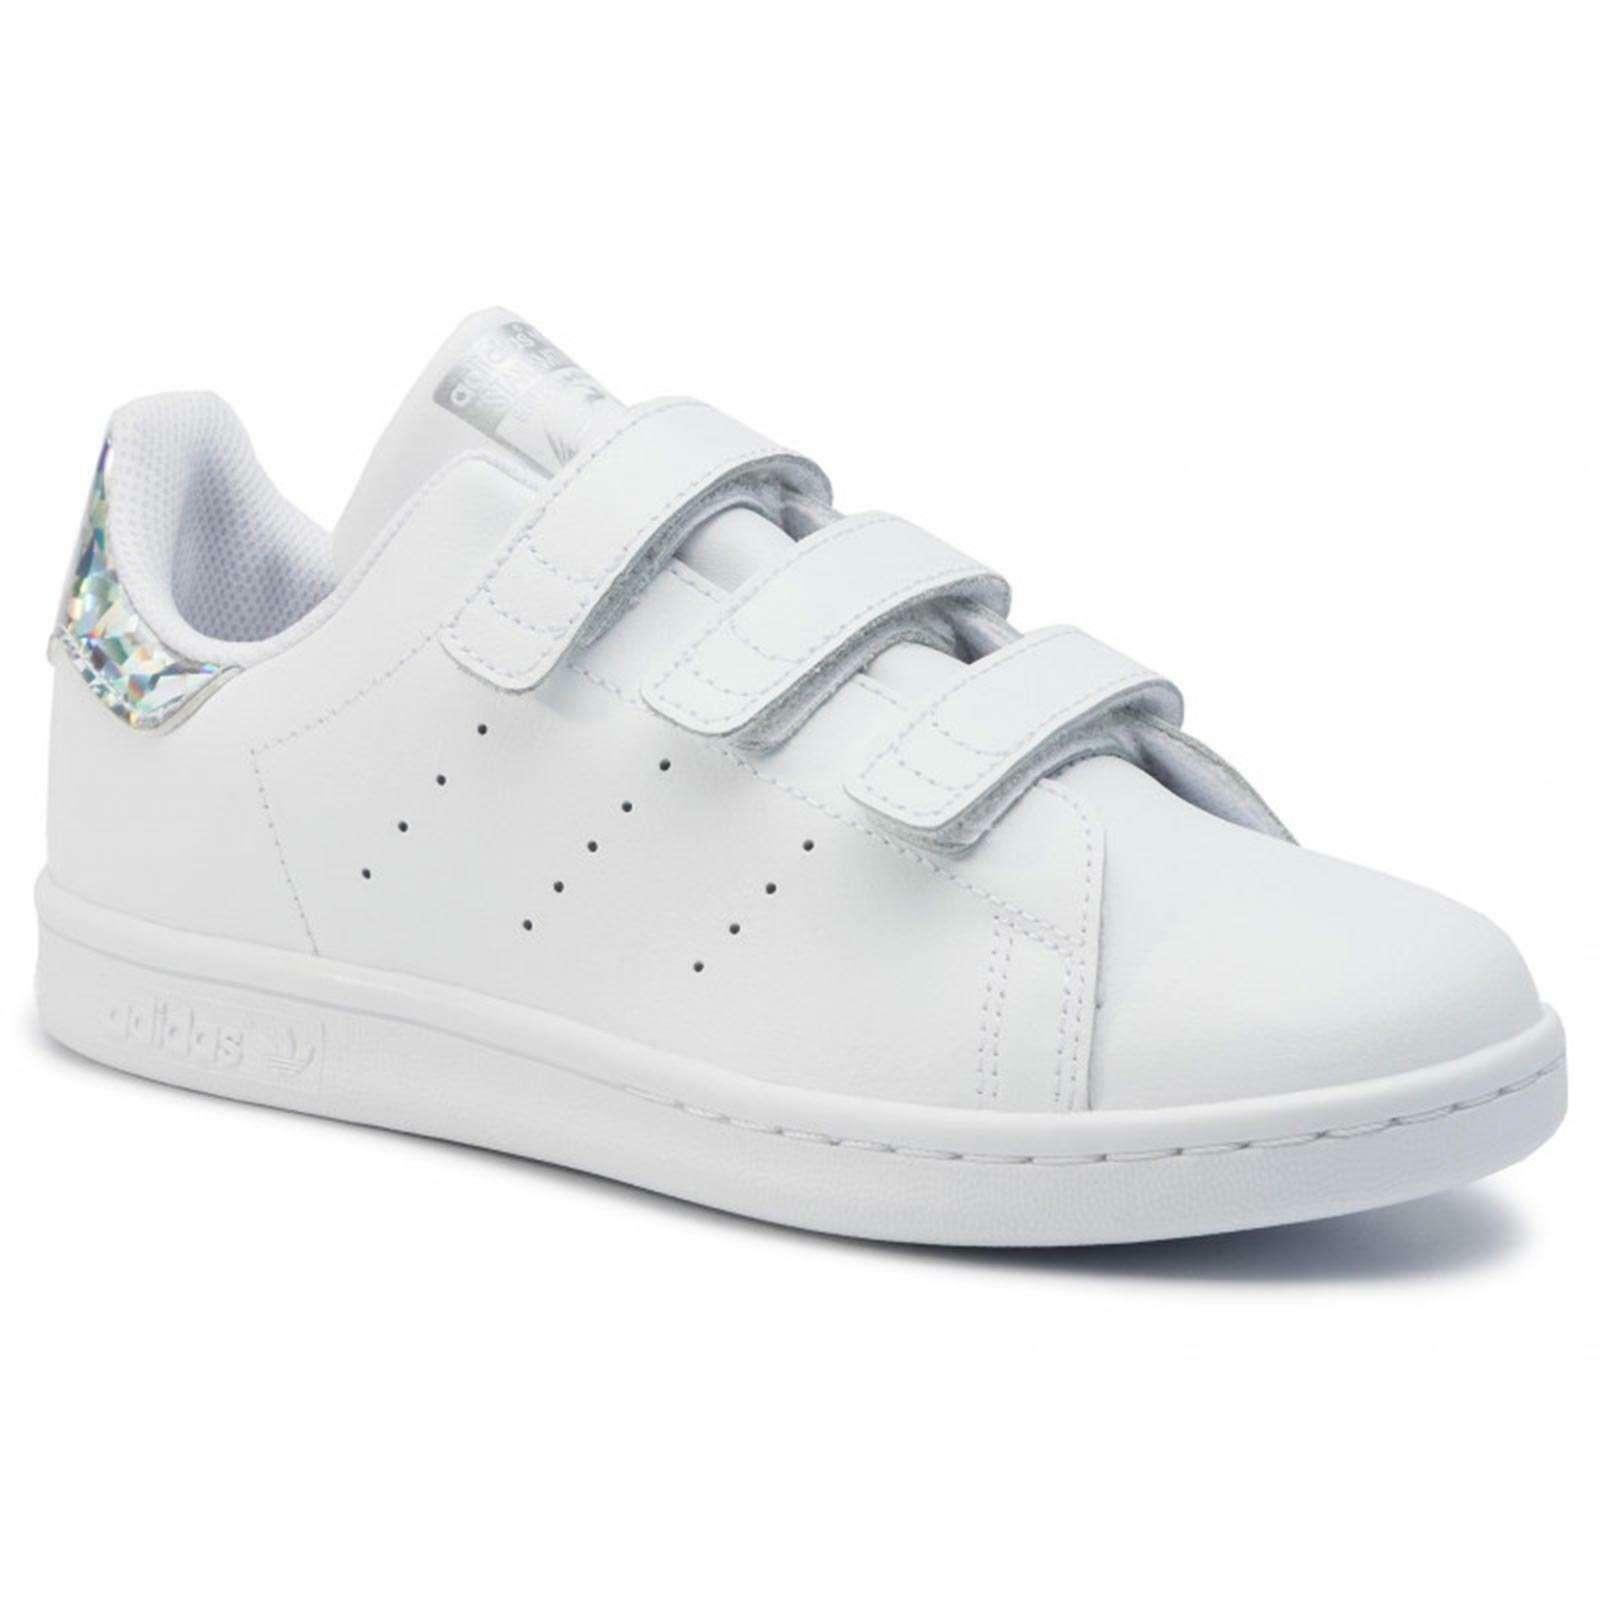 adidas adidas stan smith cf c bambina ee8484 bianco